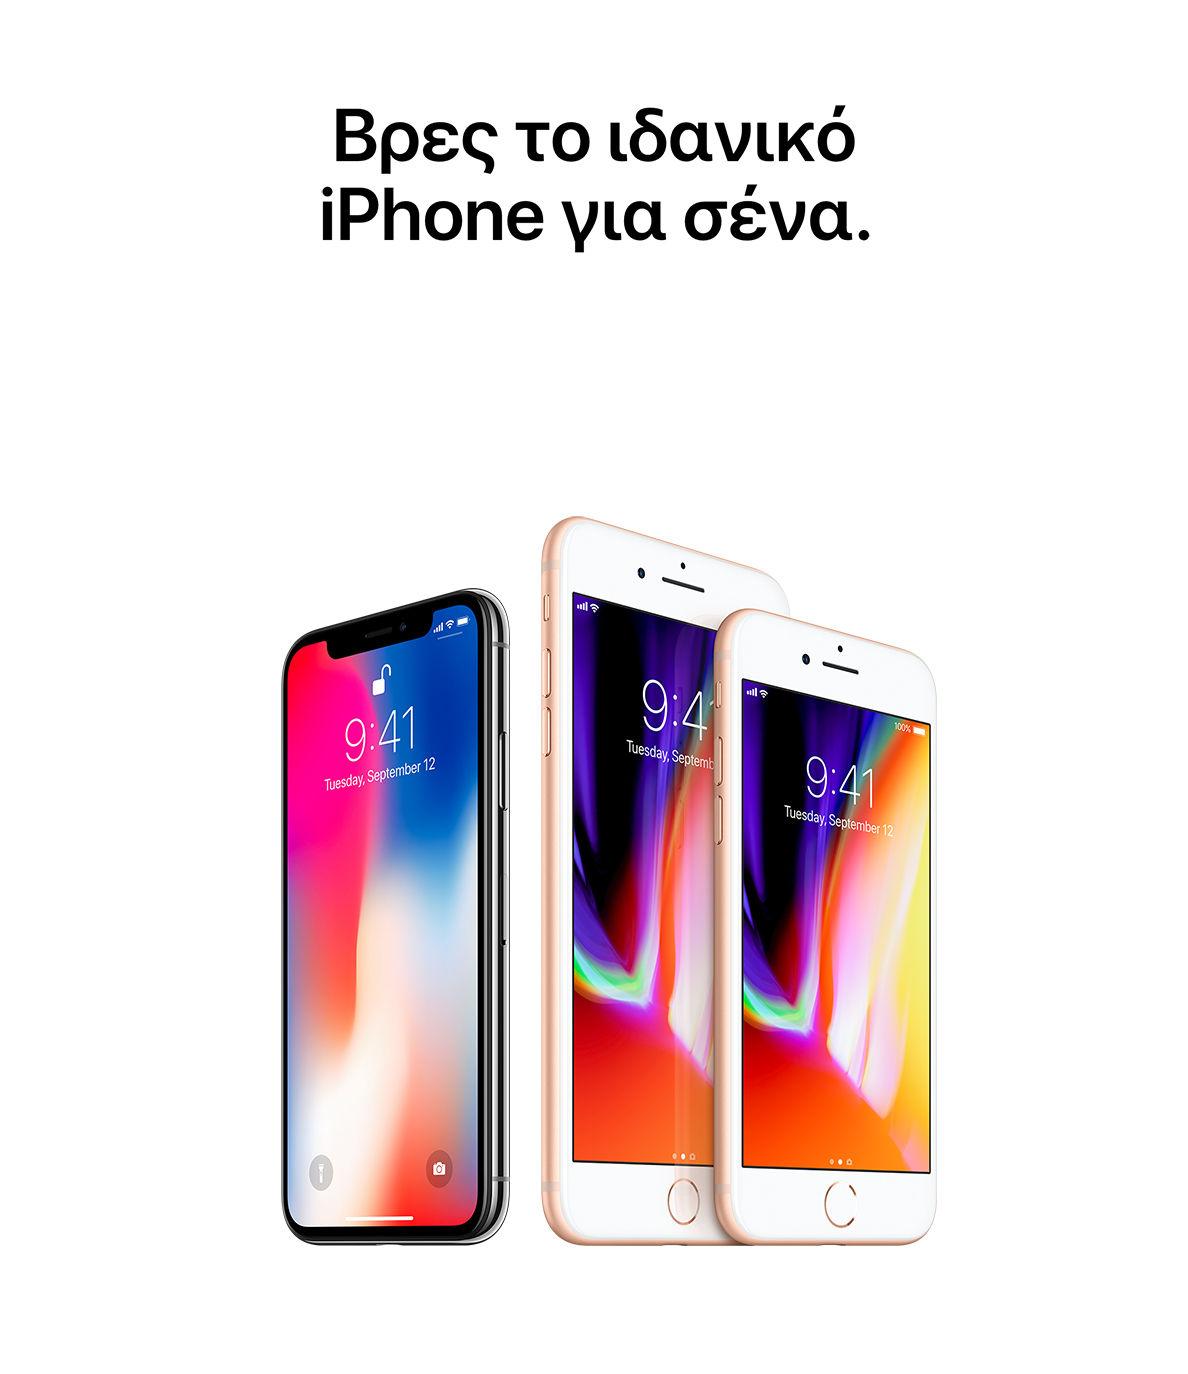 iPhonex-agora-Ellada-Mediamarkt-public-kotsovolos-germanos-iPhoneX-diathesimo-gia-paraggelia-november-2017 (16)